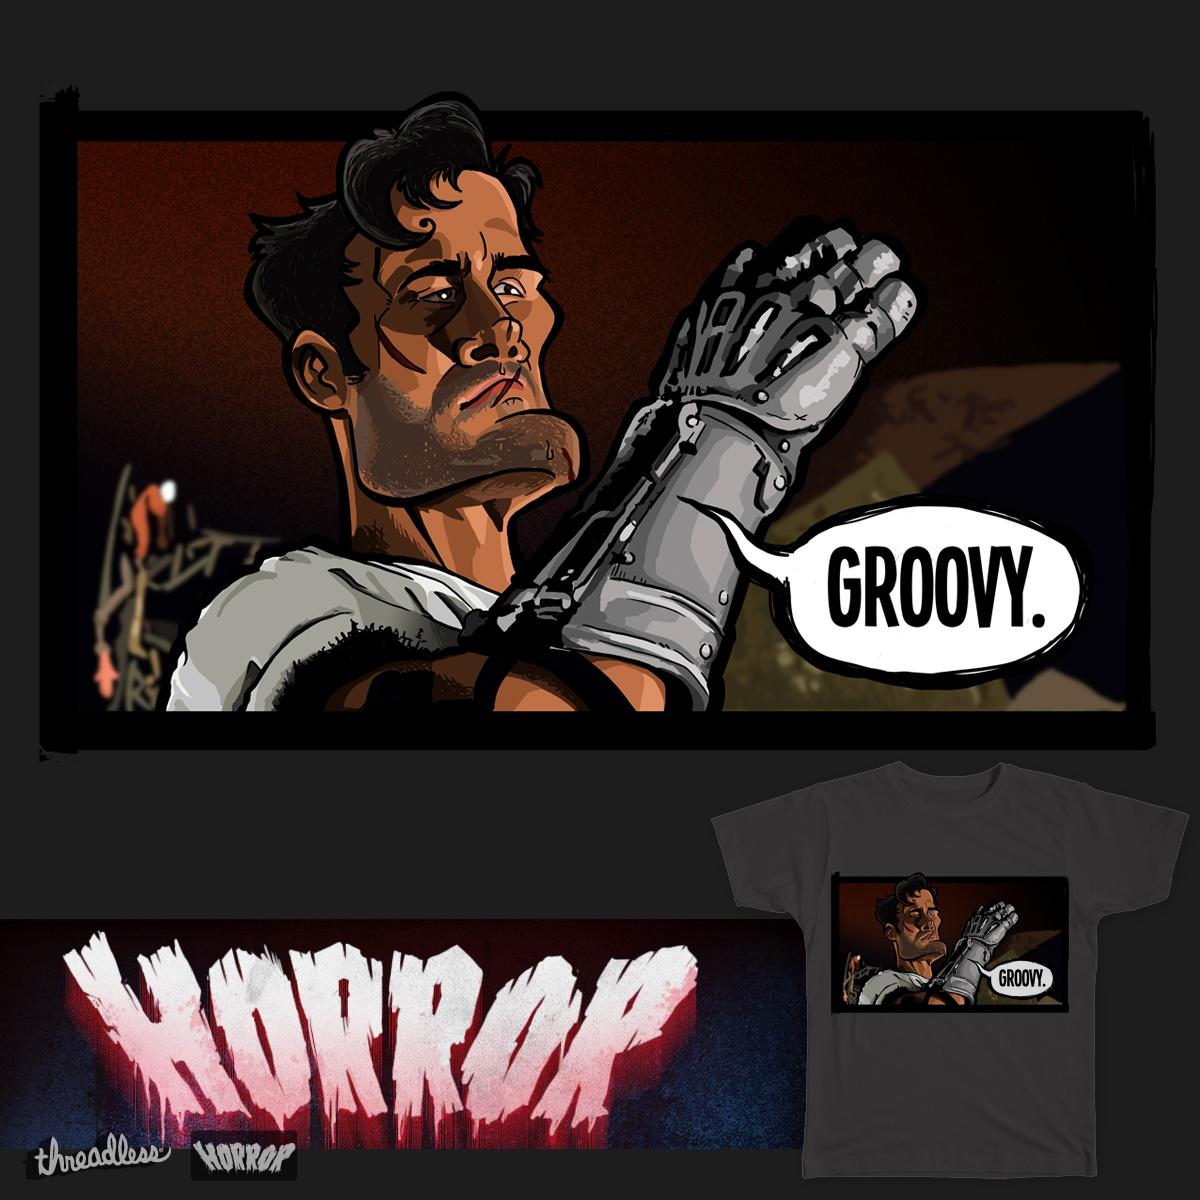 Groovy by binarygod on Threadless